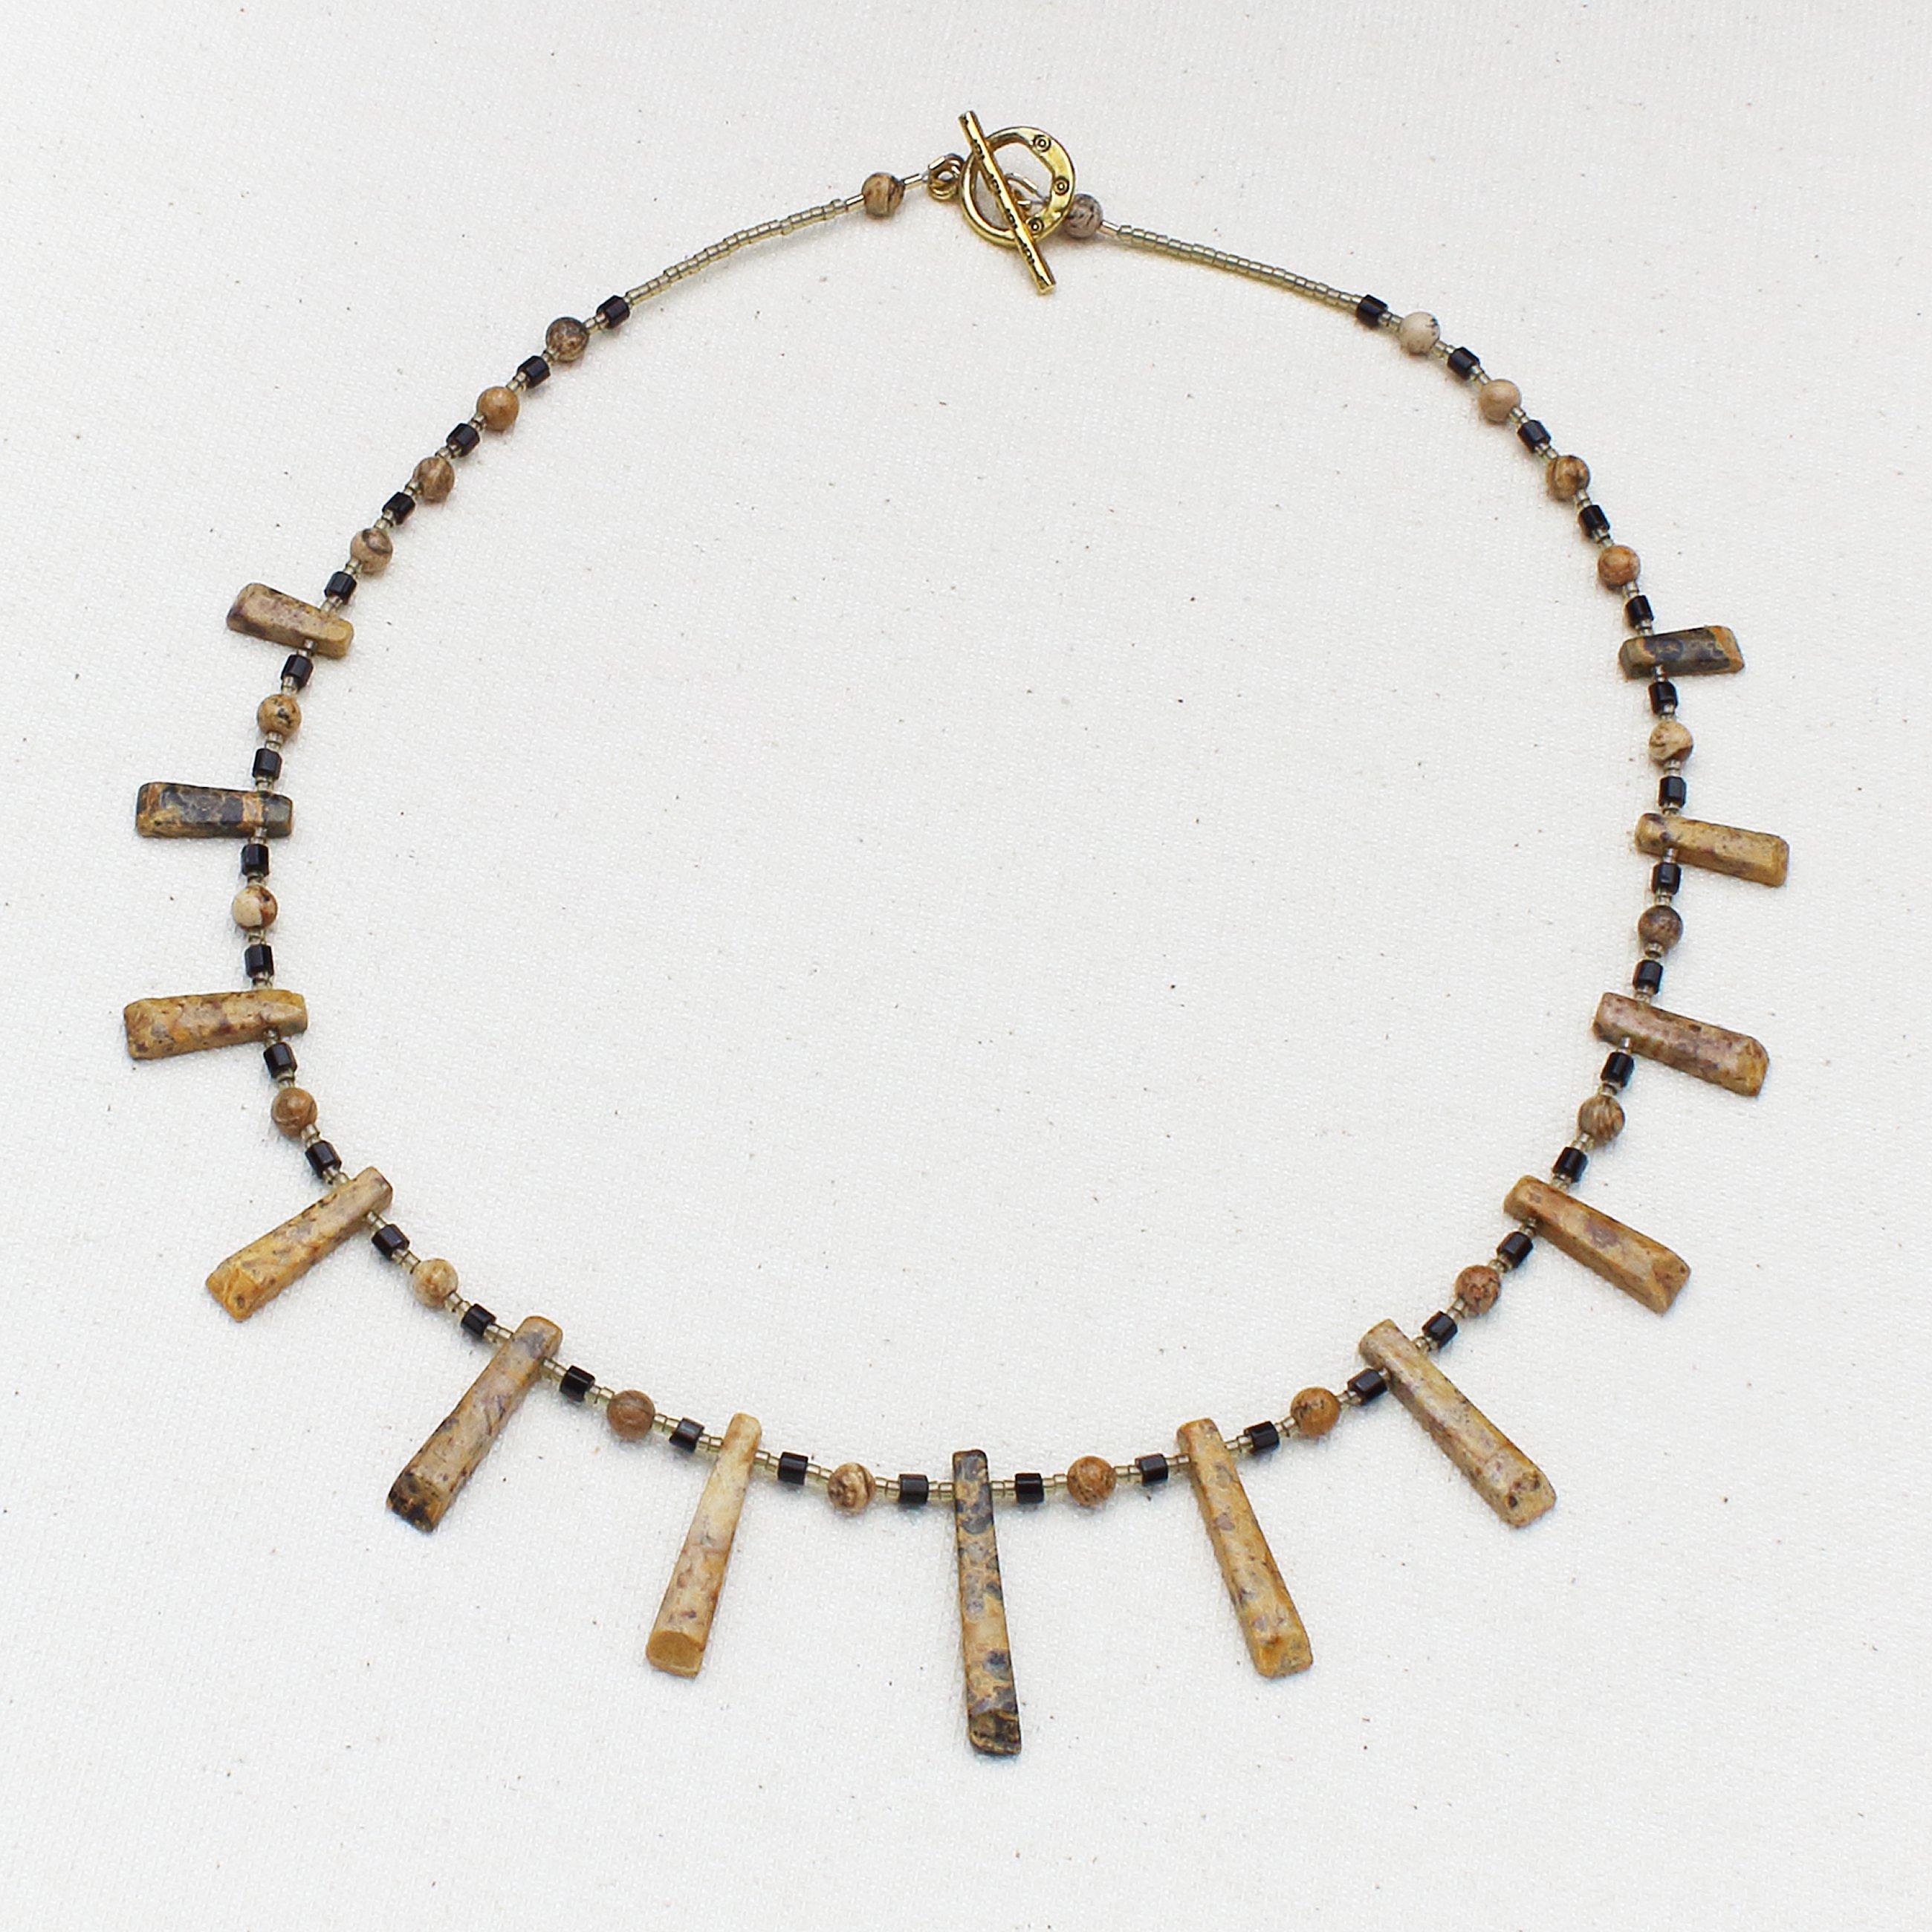 Fan of Sands Necklace